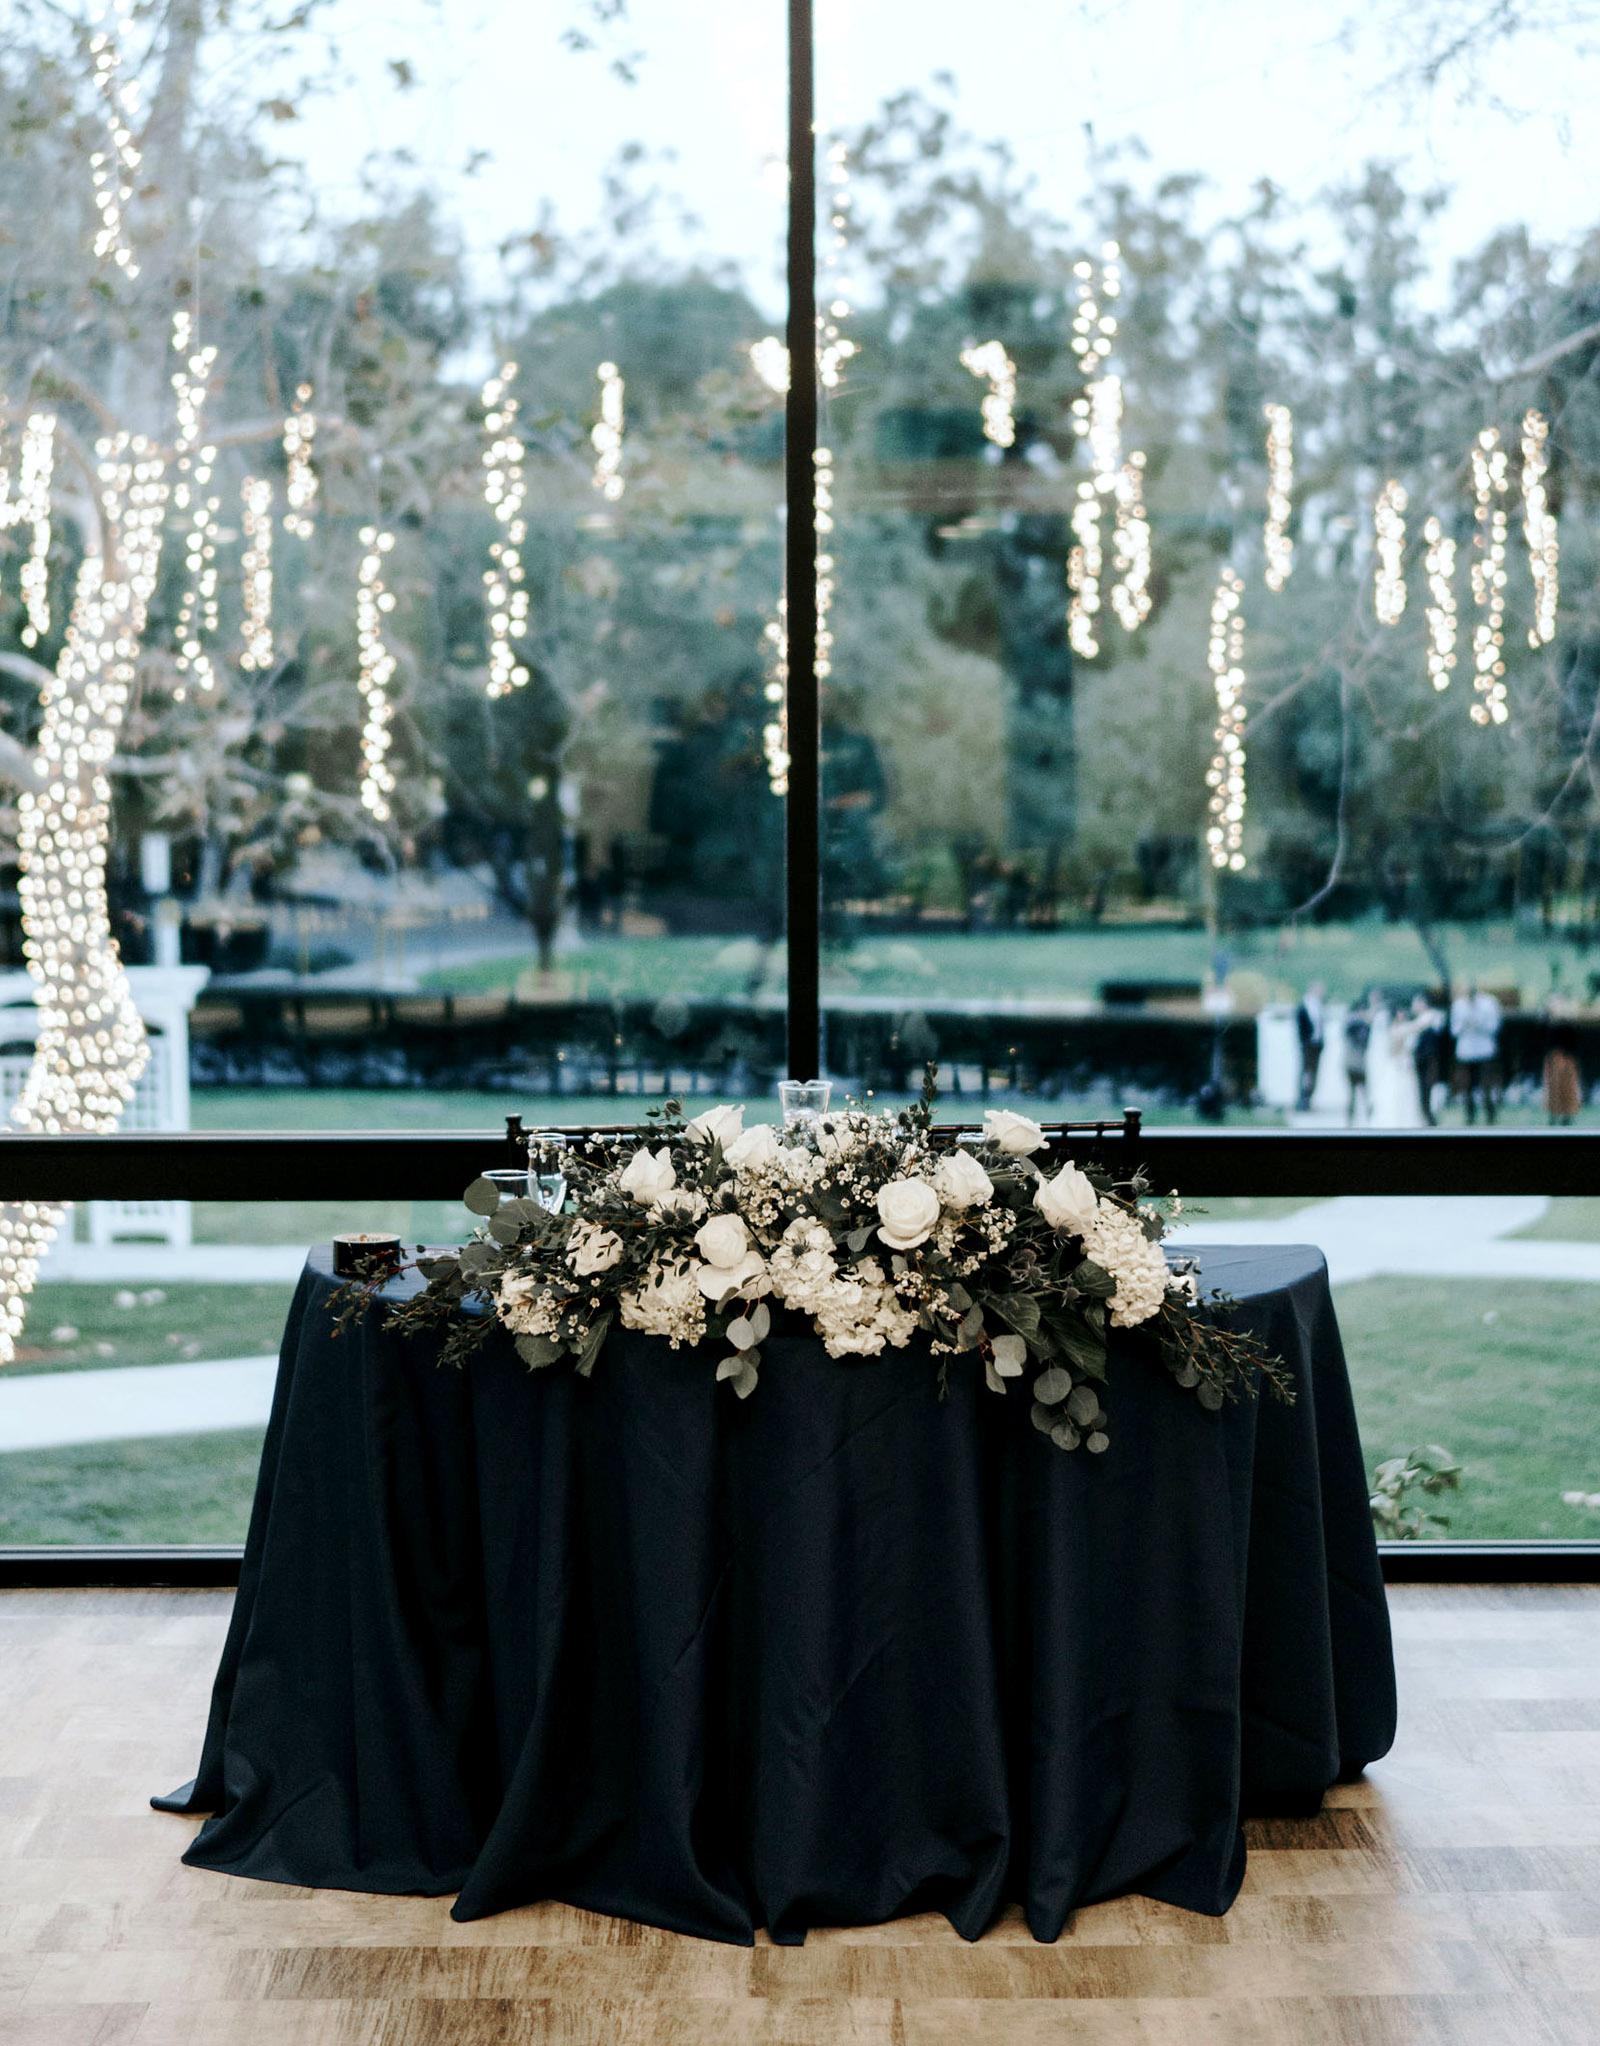 Sweetheart table - University Club - Irvine, California - Orange County - Wedgewood Weddings